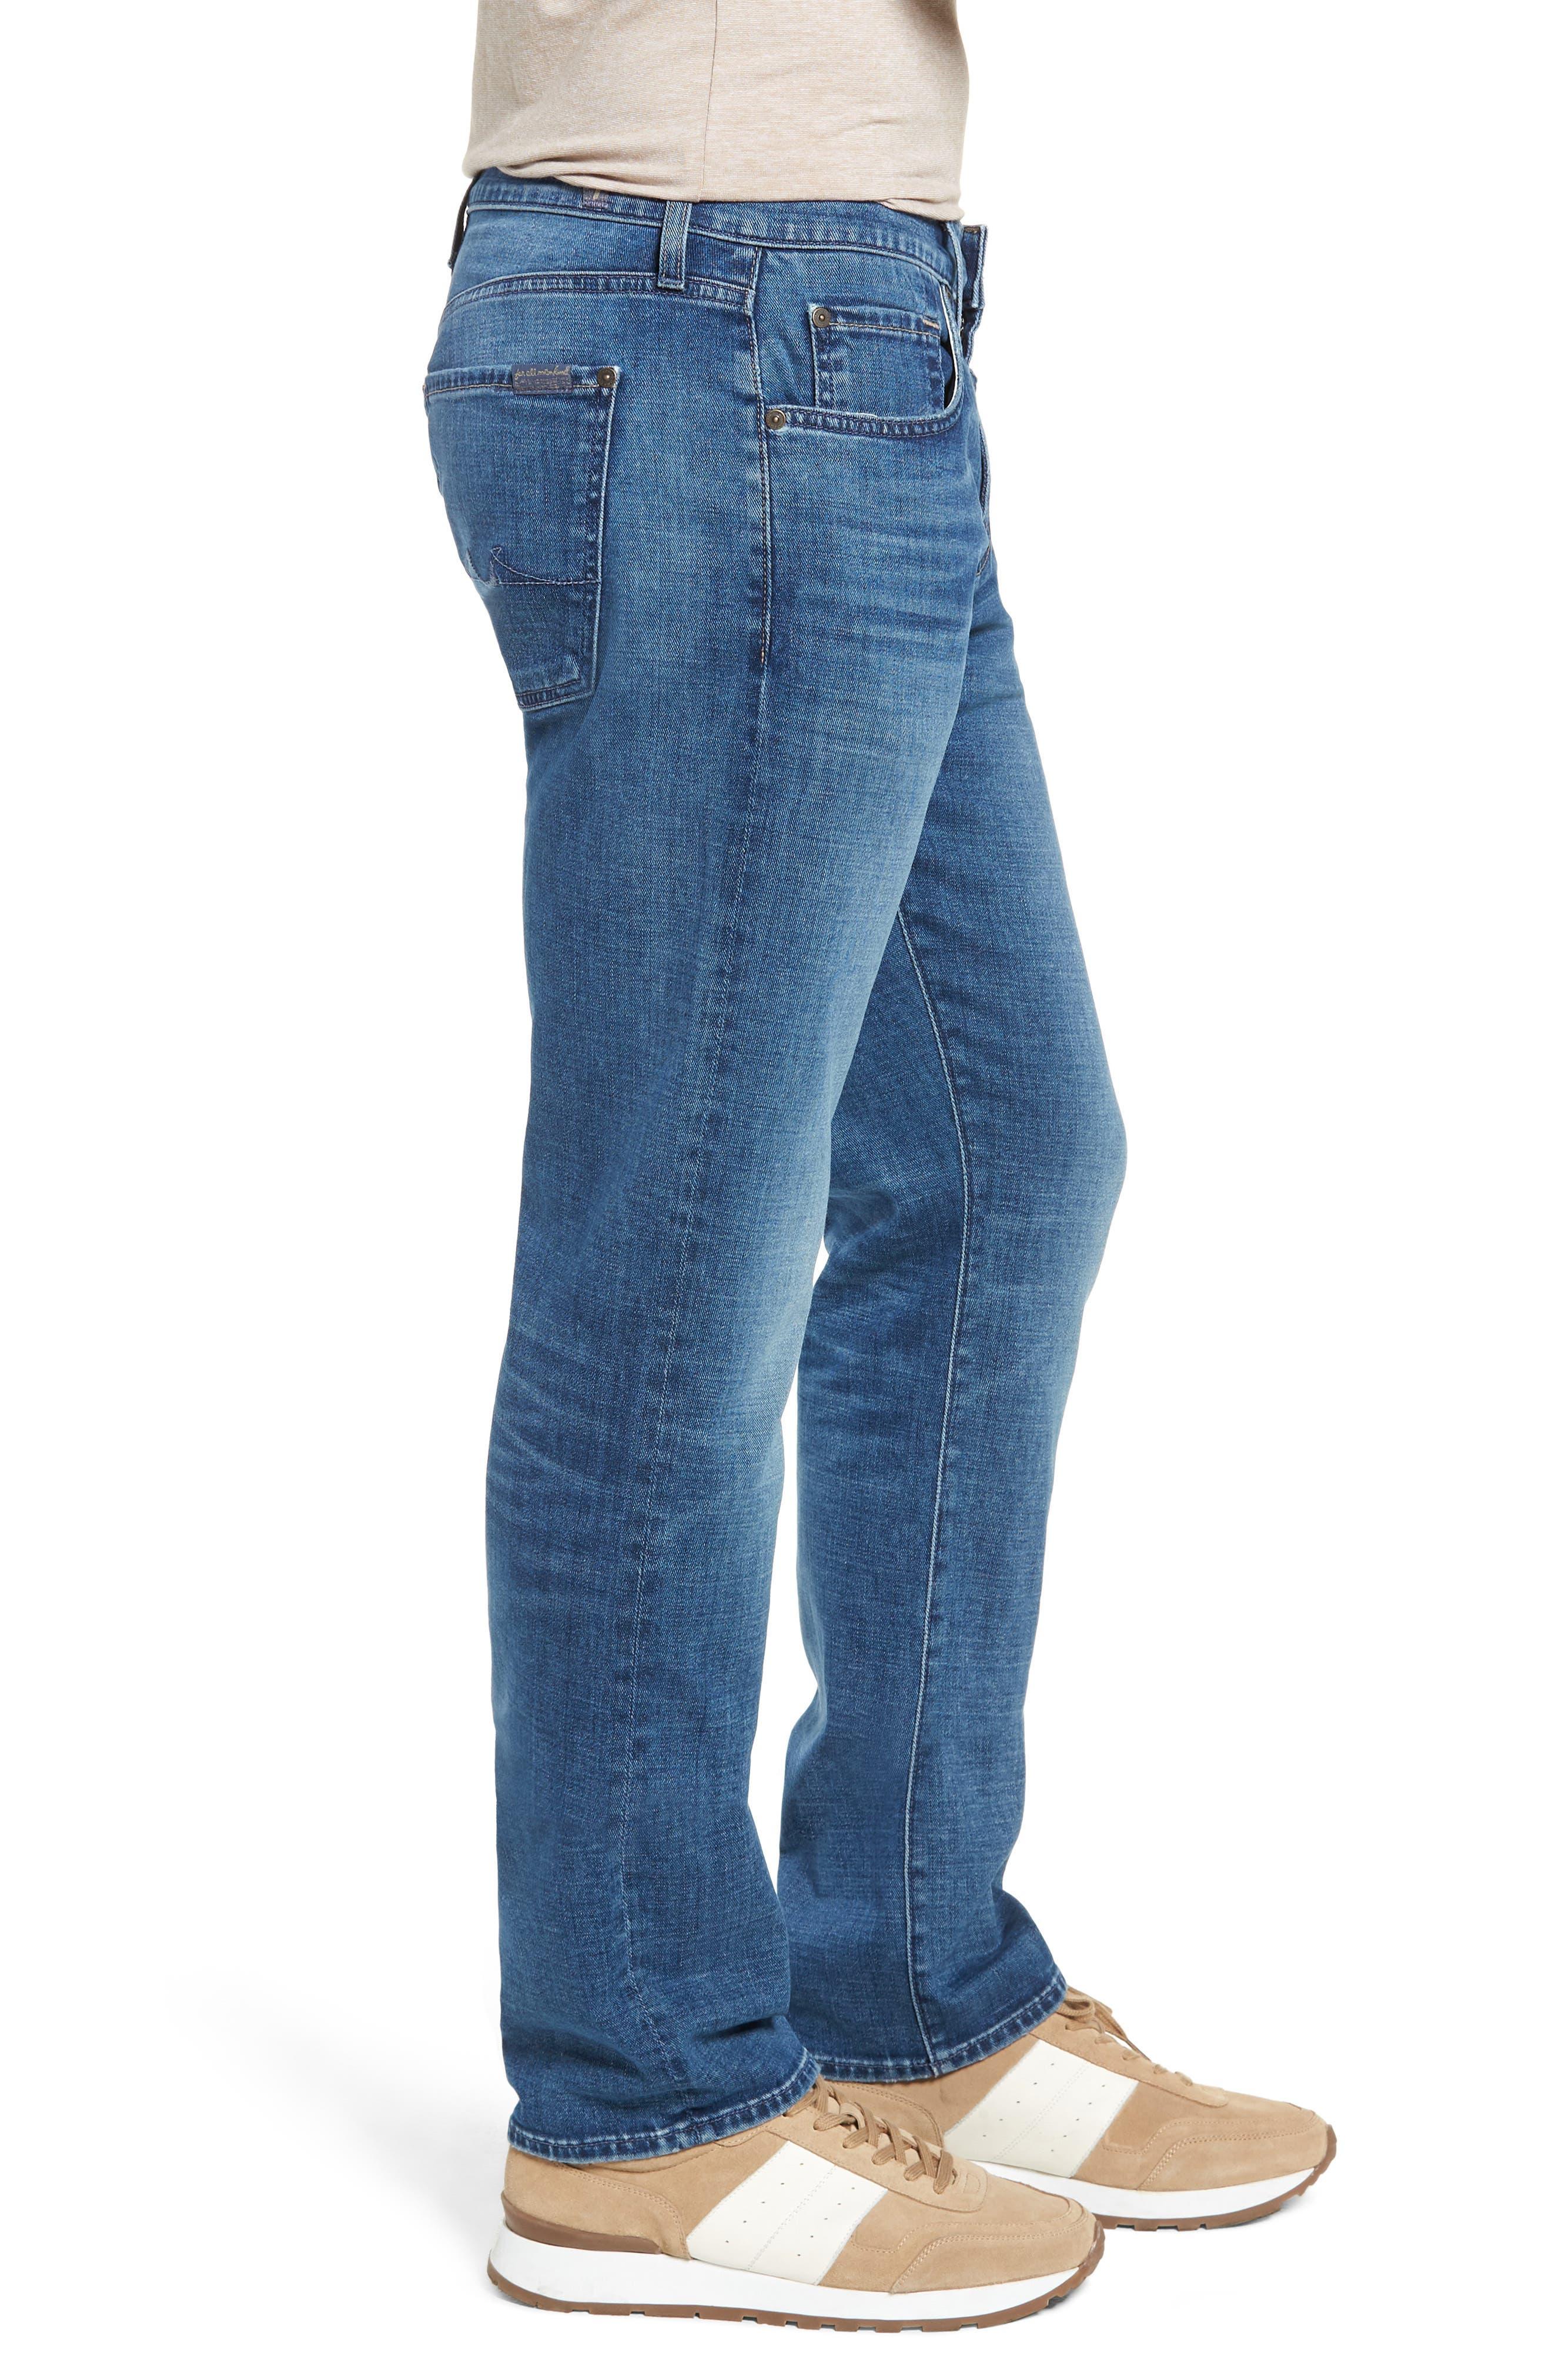 7 FOR ALL MANKIND<SUP>®</SUP>, Straight Slim Straight Leg Jeans, Alternate thumbnail 4, color, LYNNWOOD-LYNN